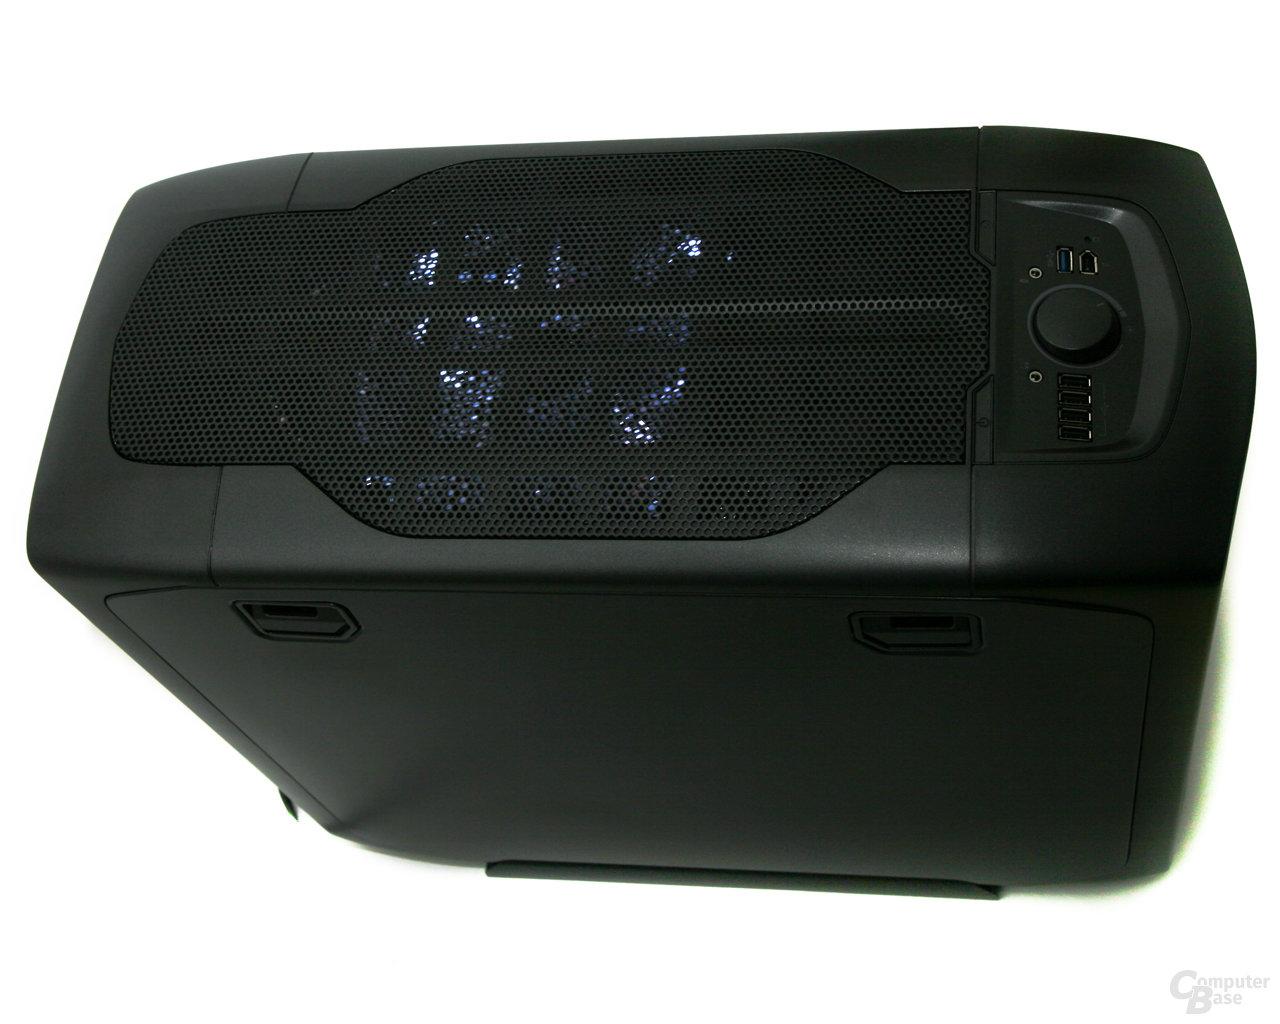 Corsair Graphite 600T – Beleuchtung Deckel